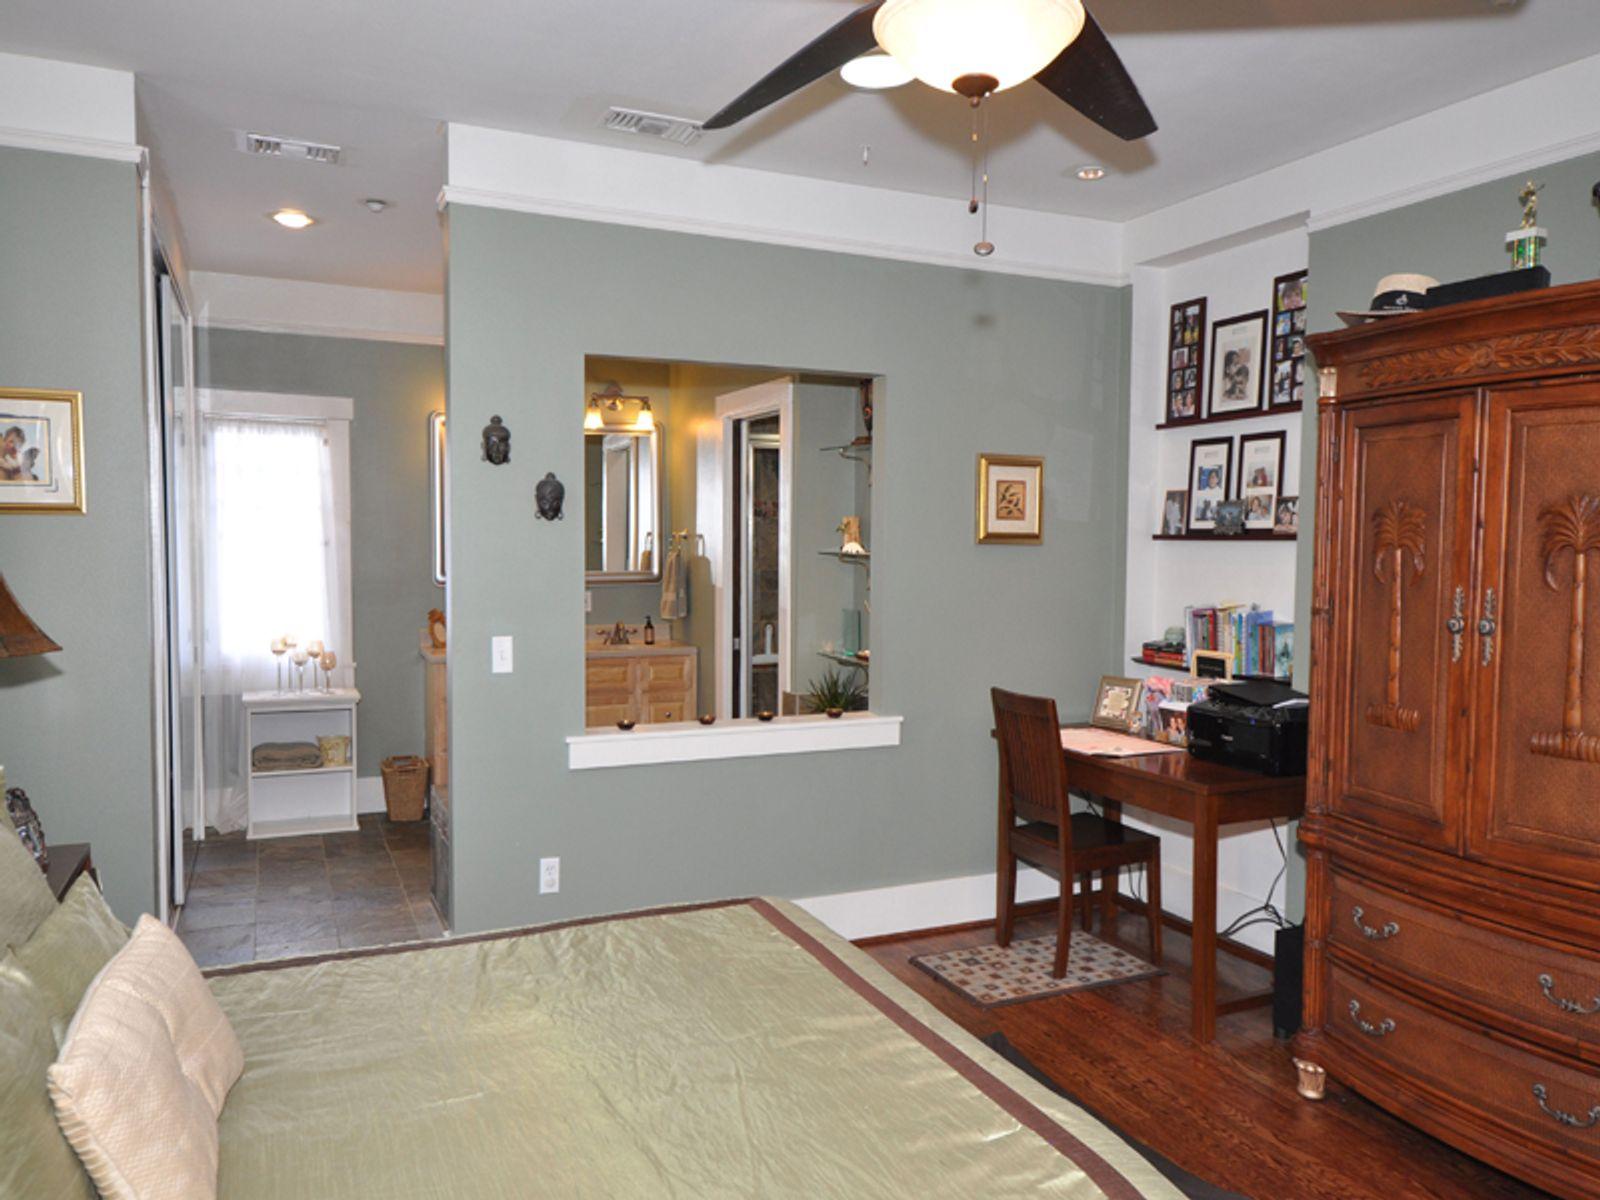 1916 Craftsman Home